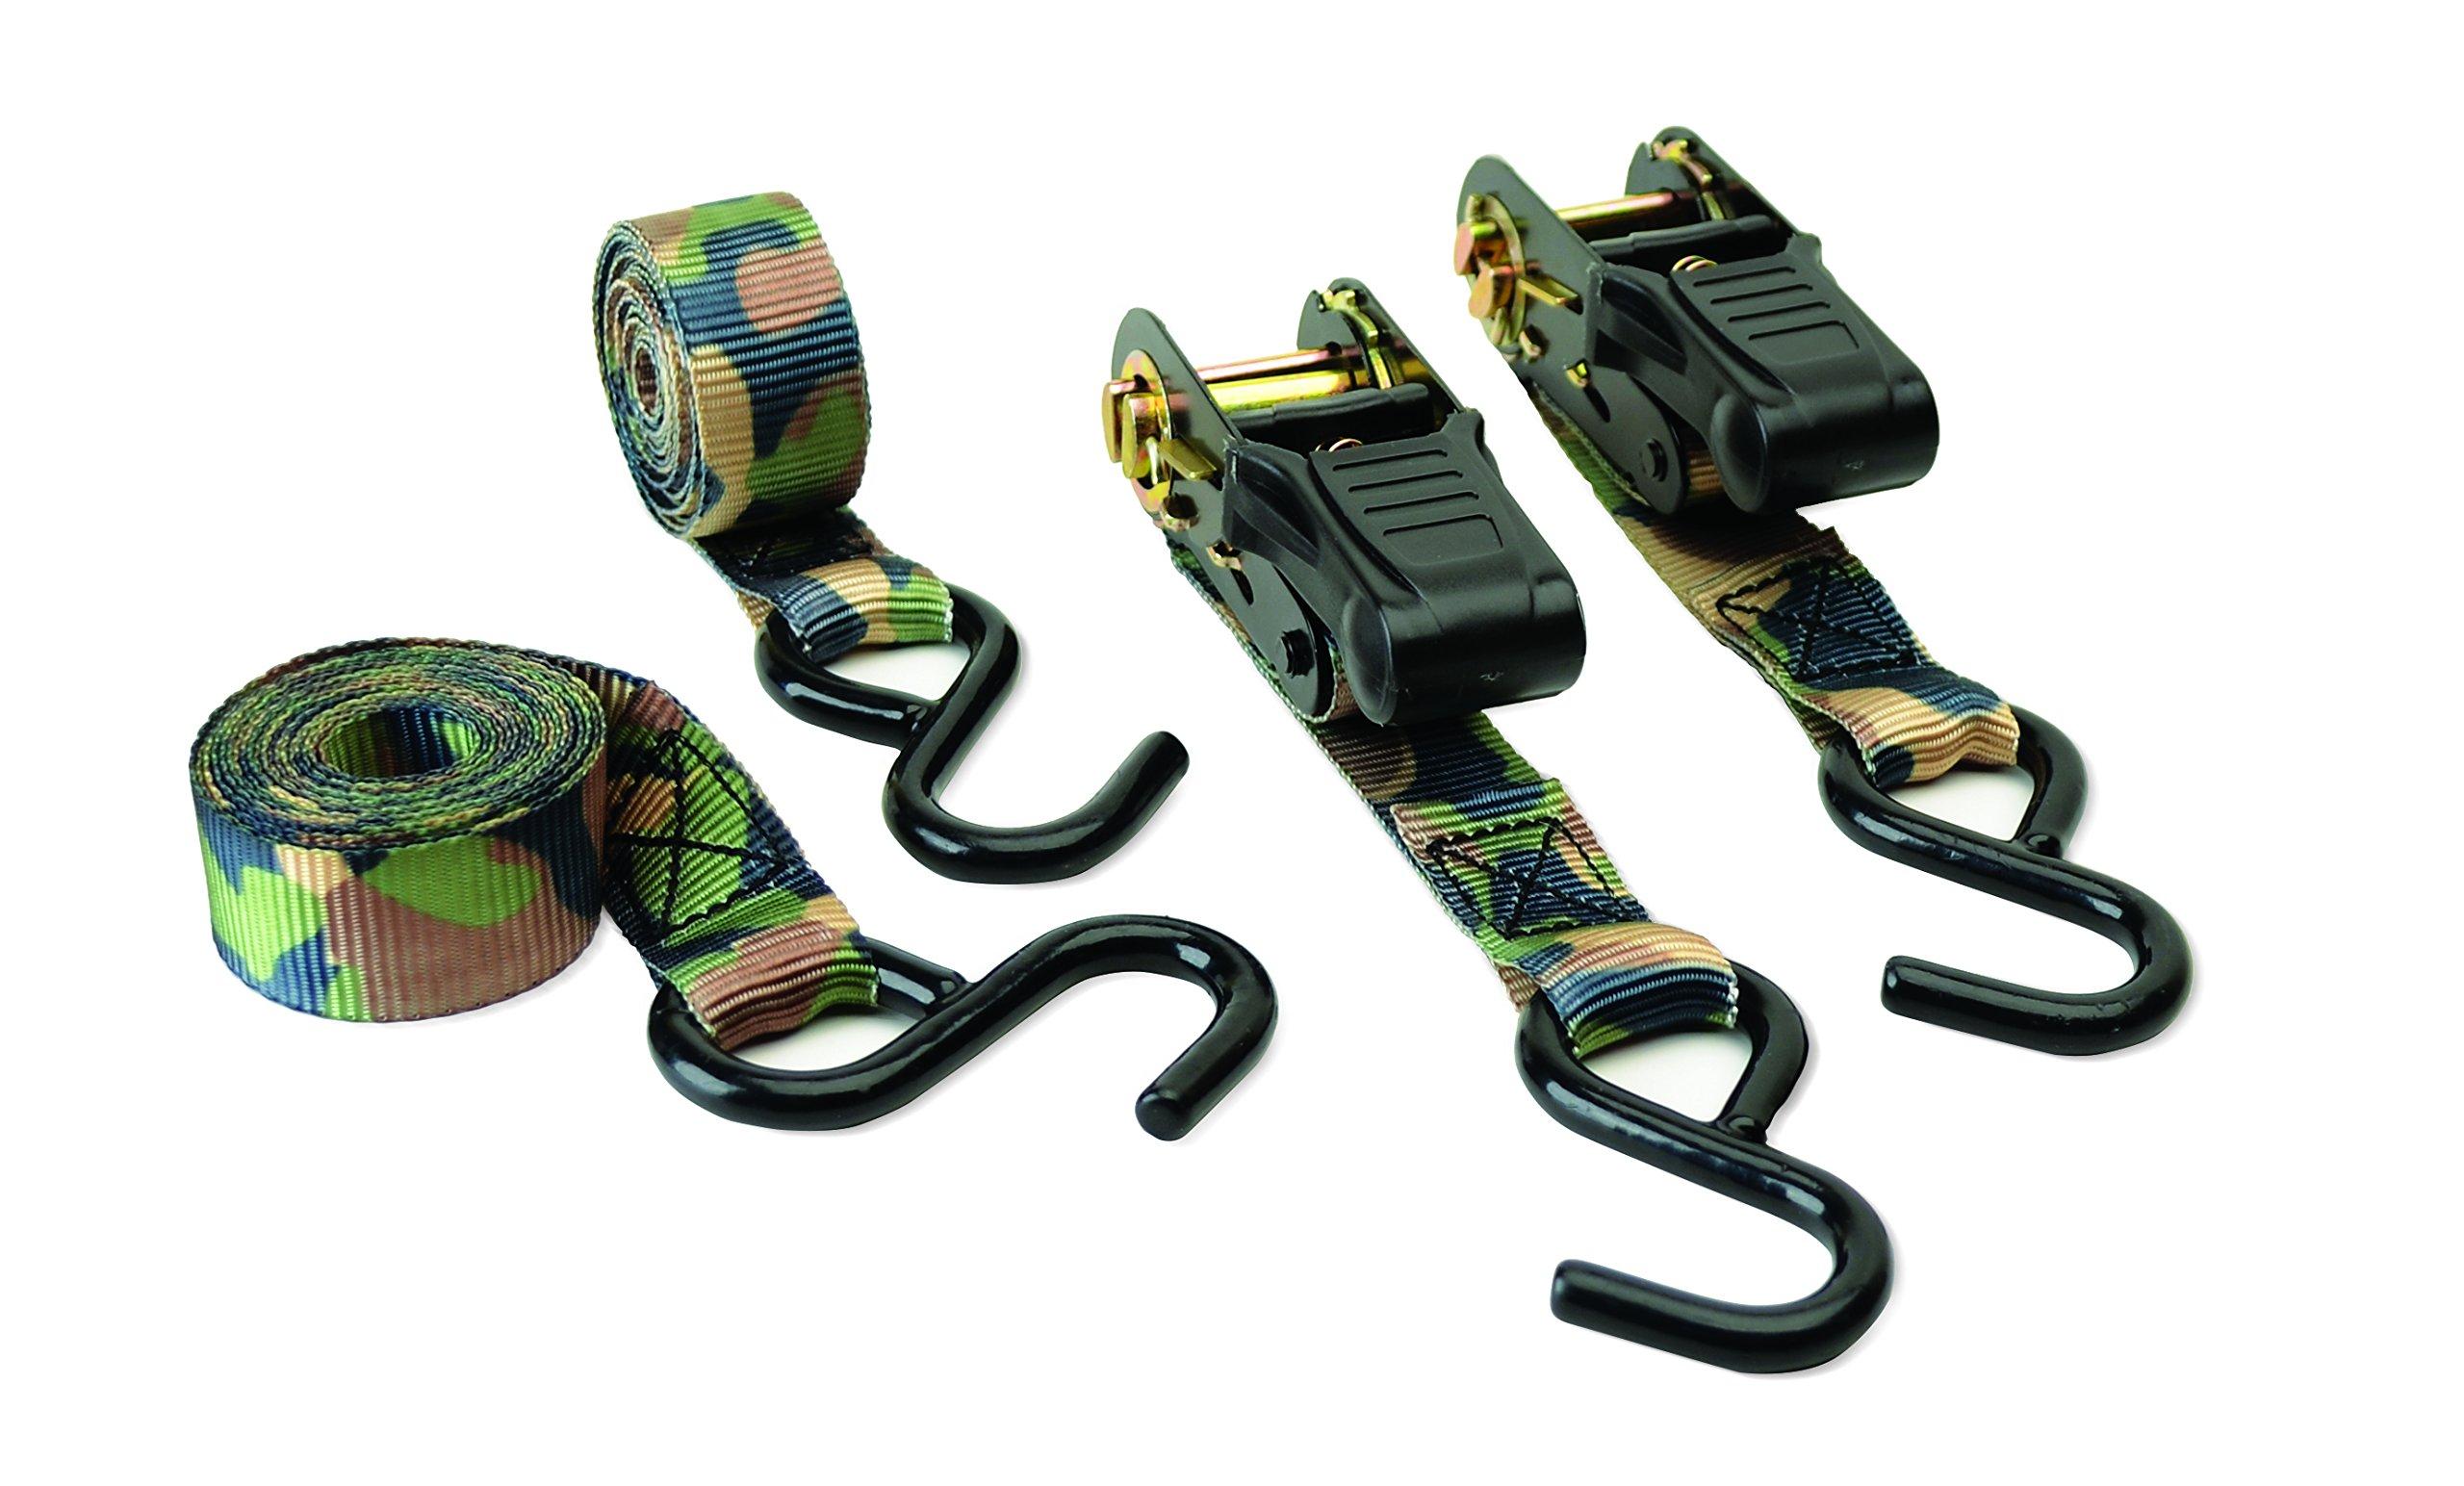 HME Products Camo Ratchet Strap- 4pk by HME